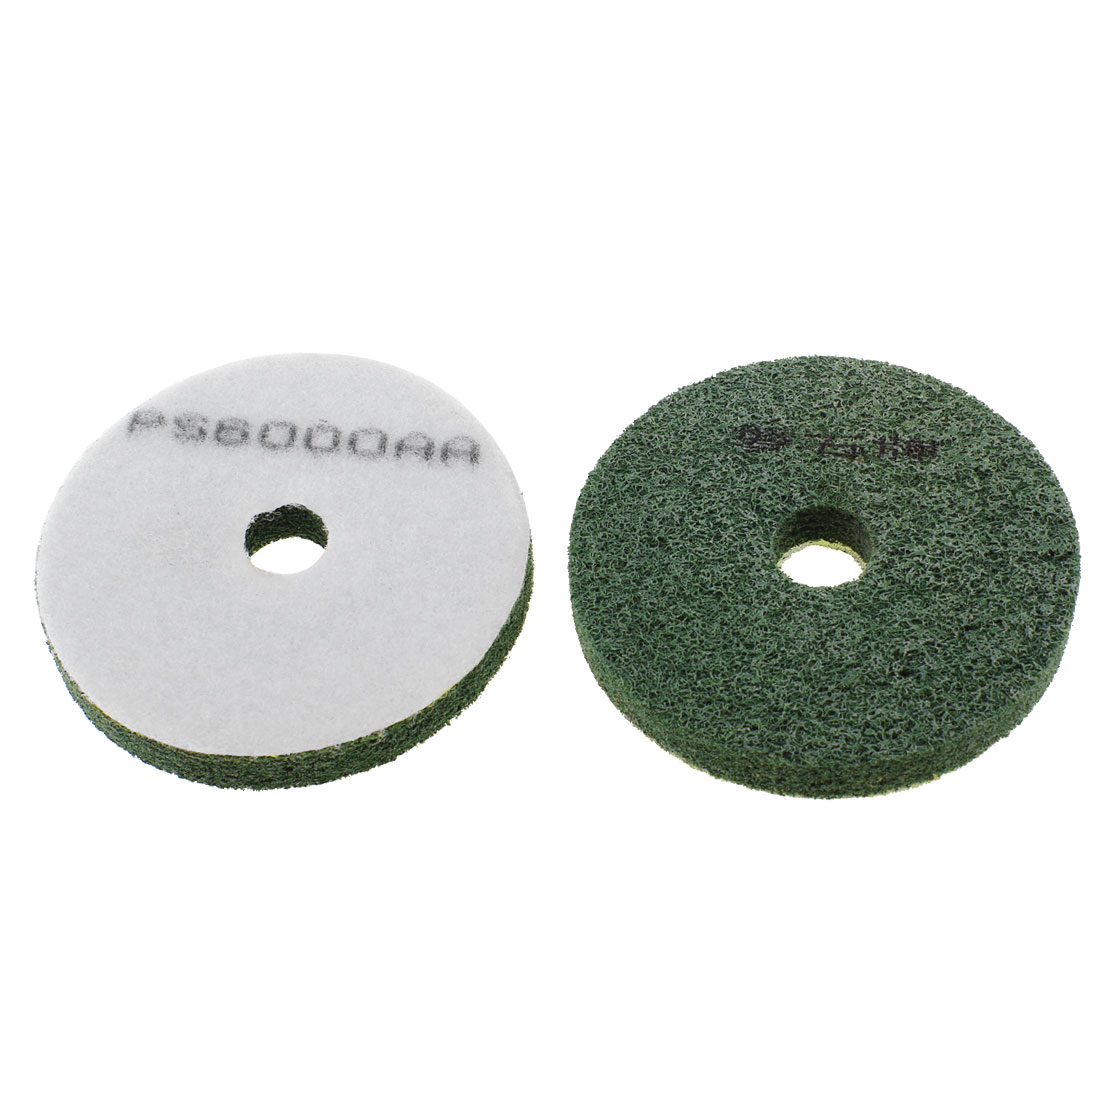 10cm Dia 6000 GritWet Concrete Diamond Polishing Pad Army Green 2 Pcs